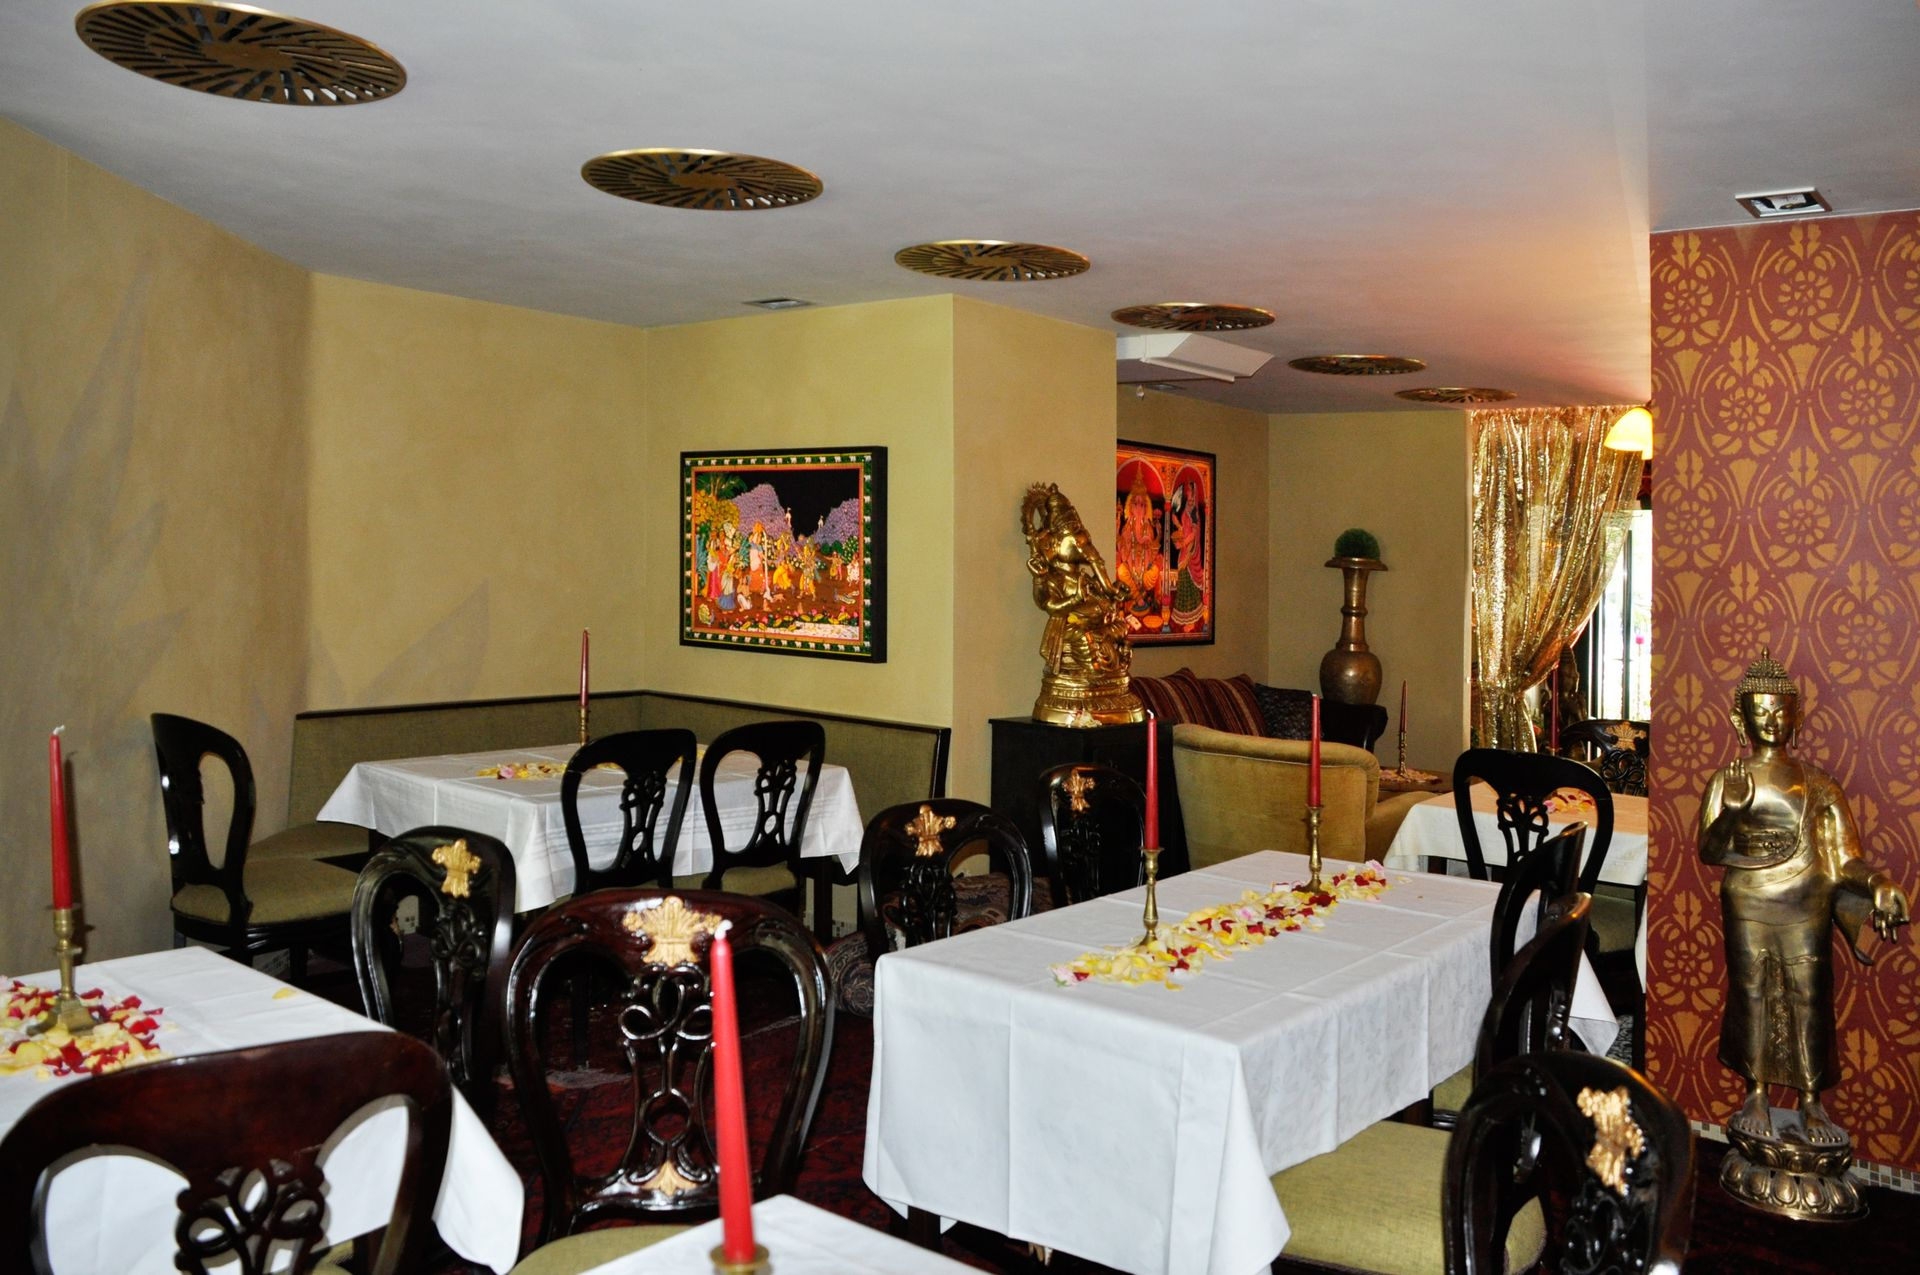 Wandgestaltung im Restauant Maharani in den Grindelhochhäusern